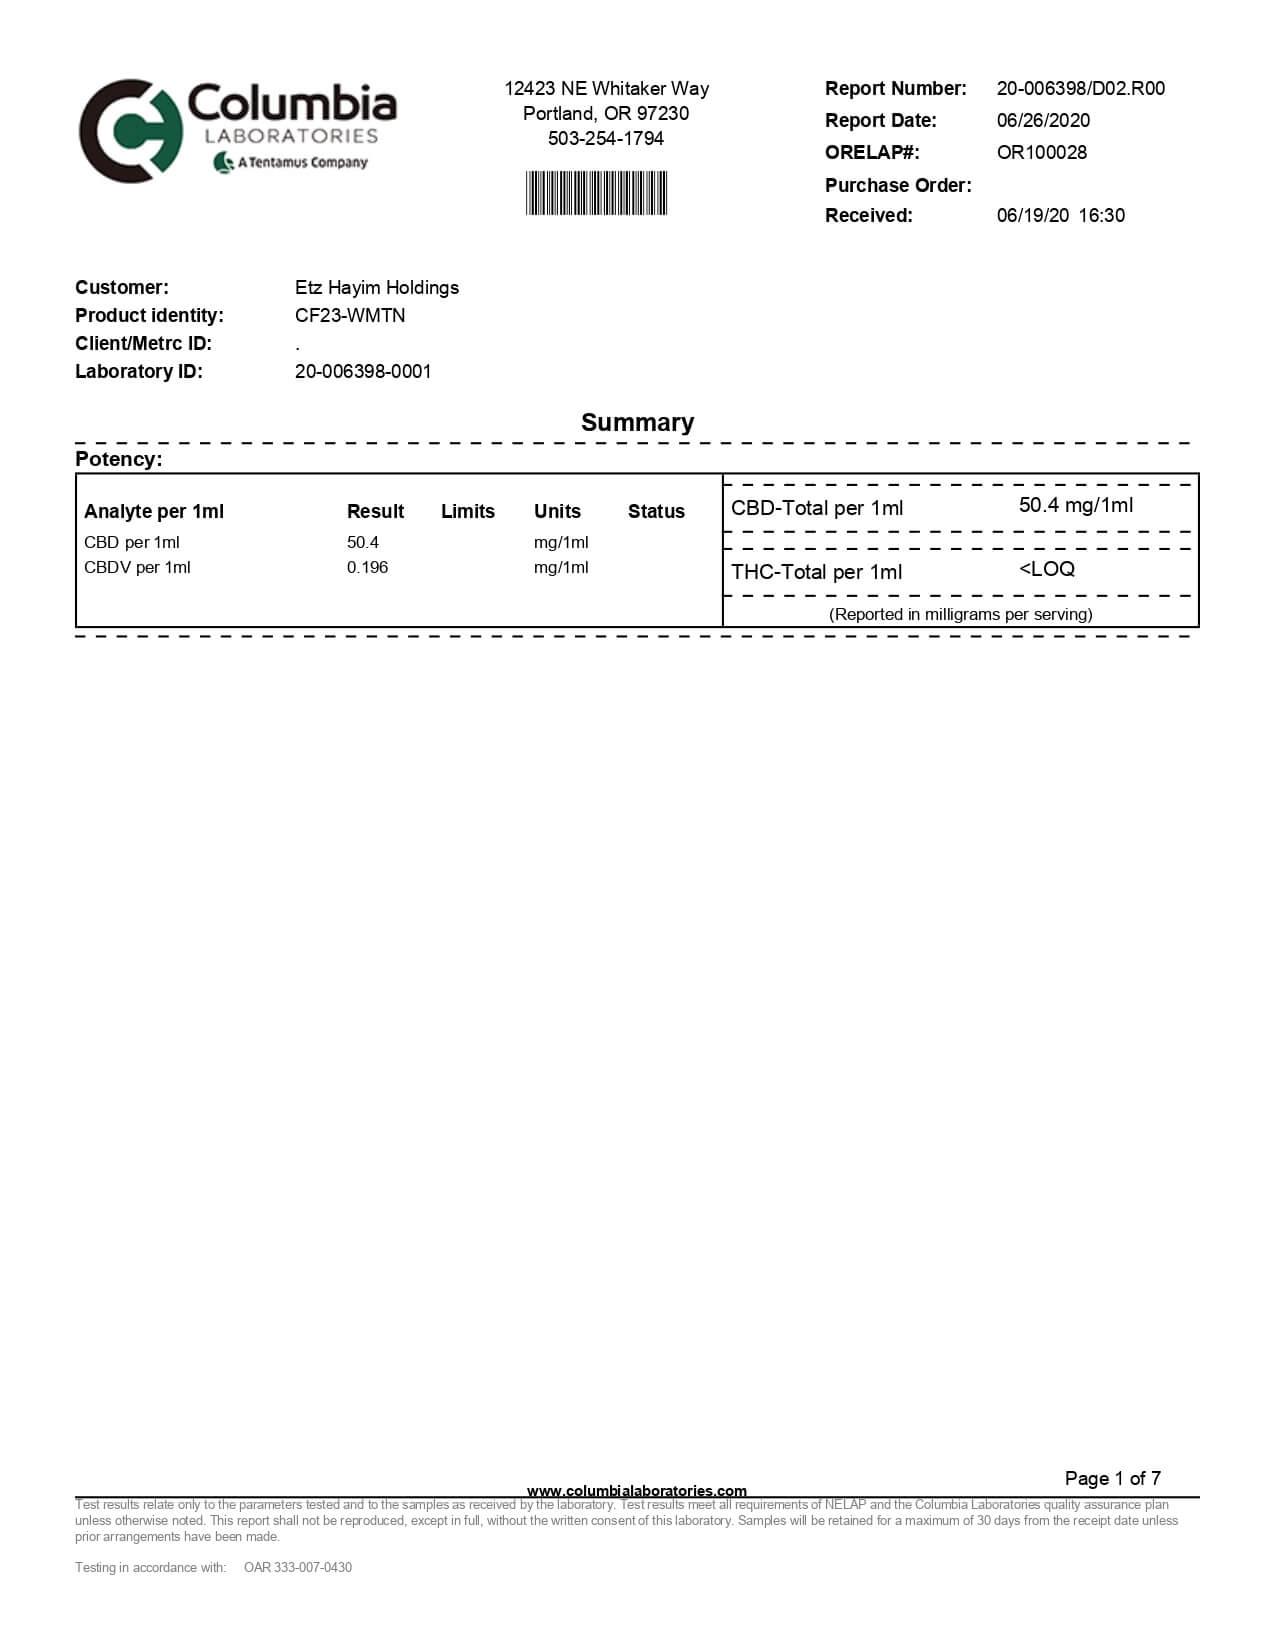 Lazarus Naturals High Potency CBD Tincture Wintermint Lab Report